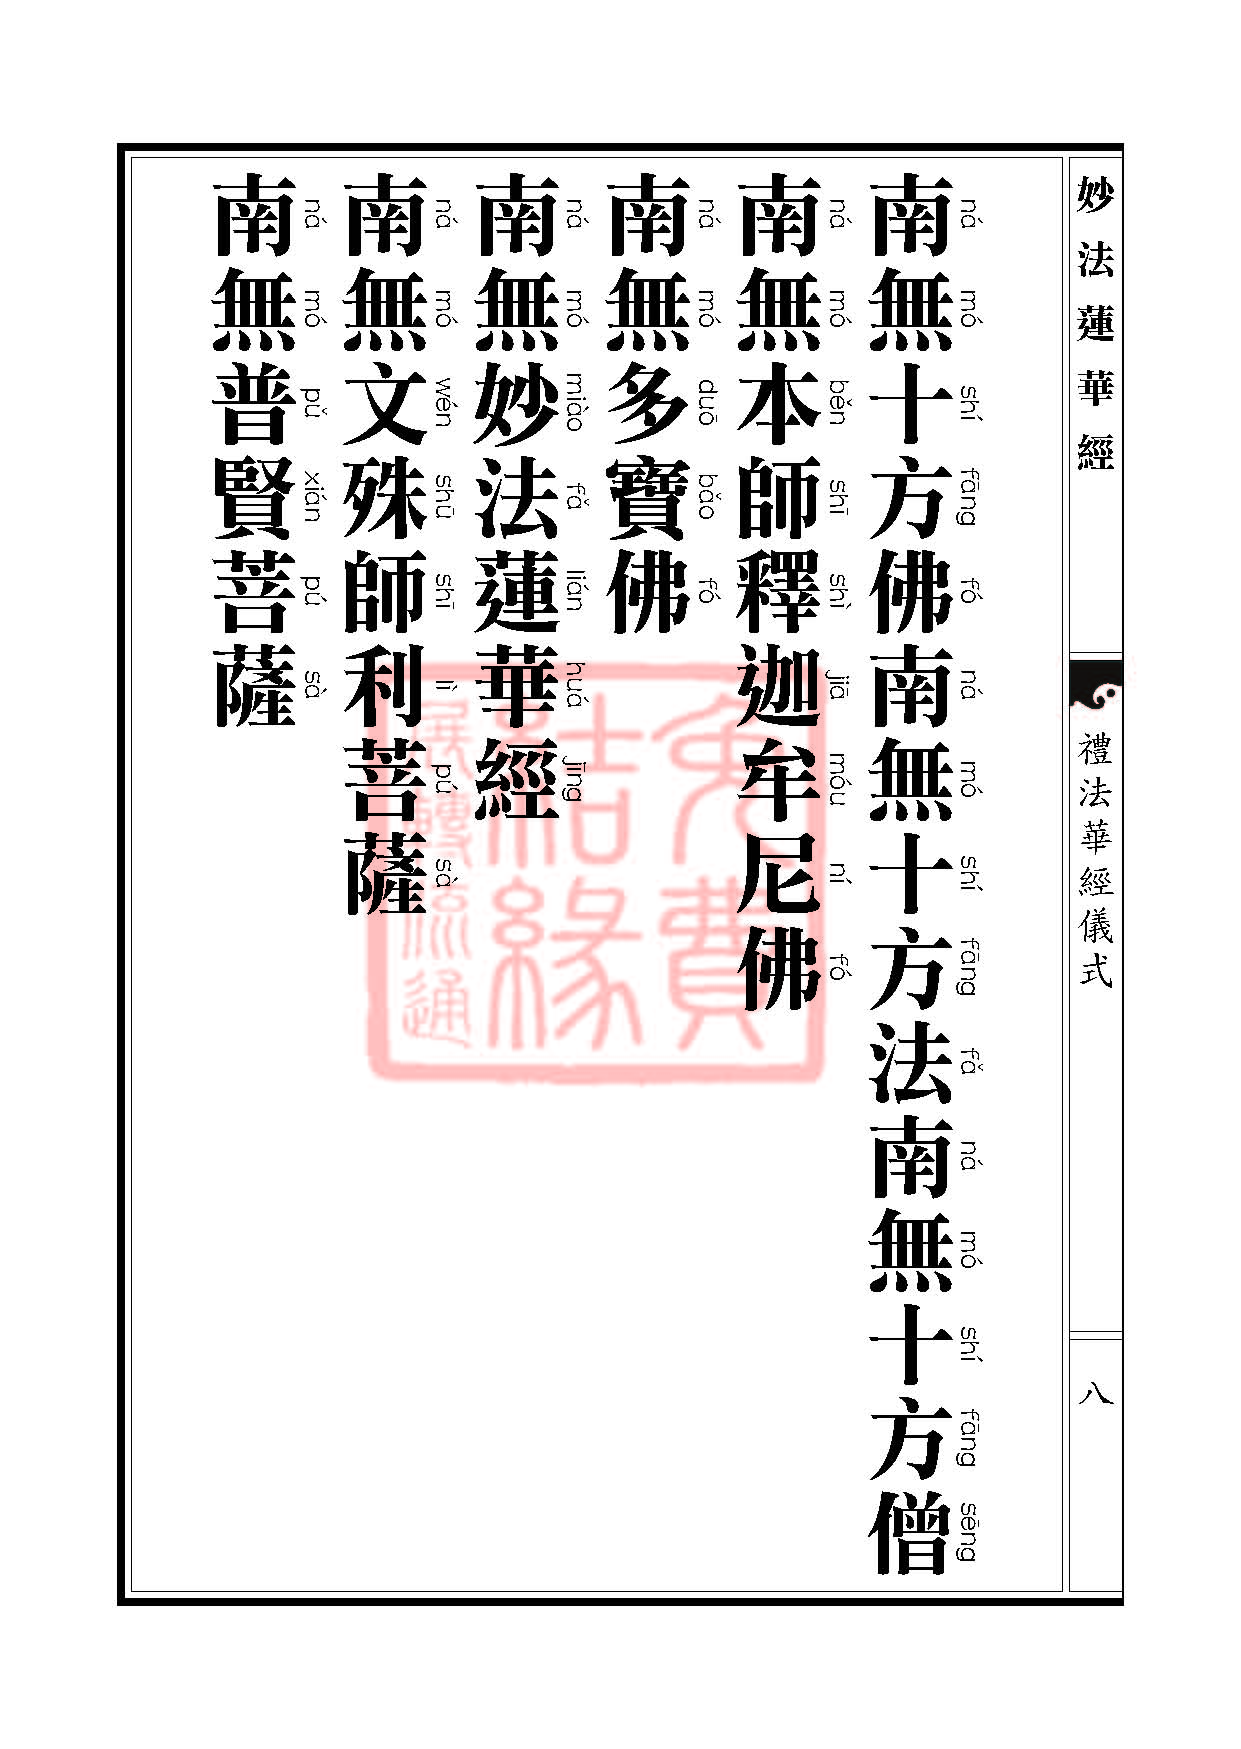 Book_FHJ_HK-A6-PY_Web_页面_008.jpg